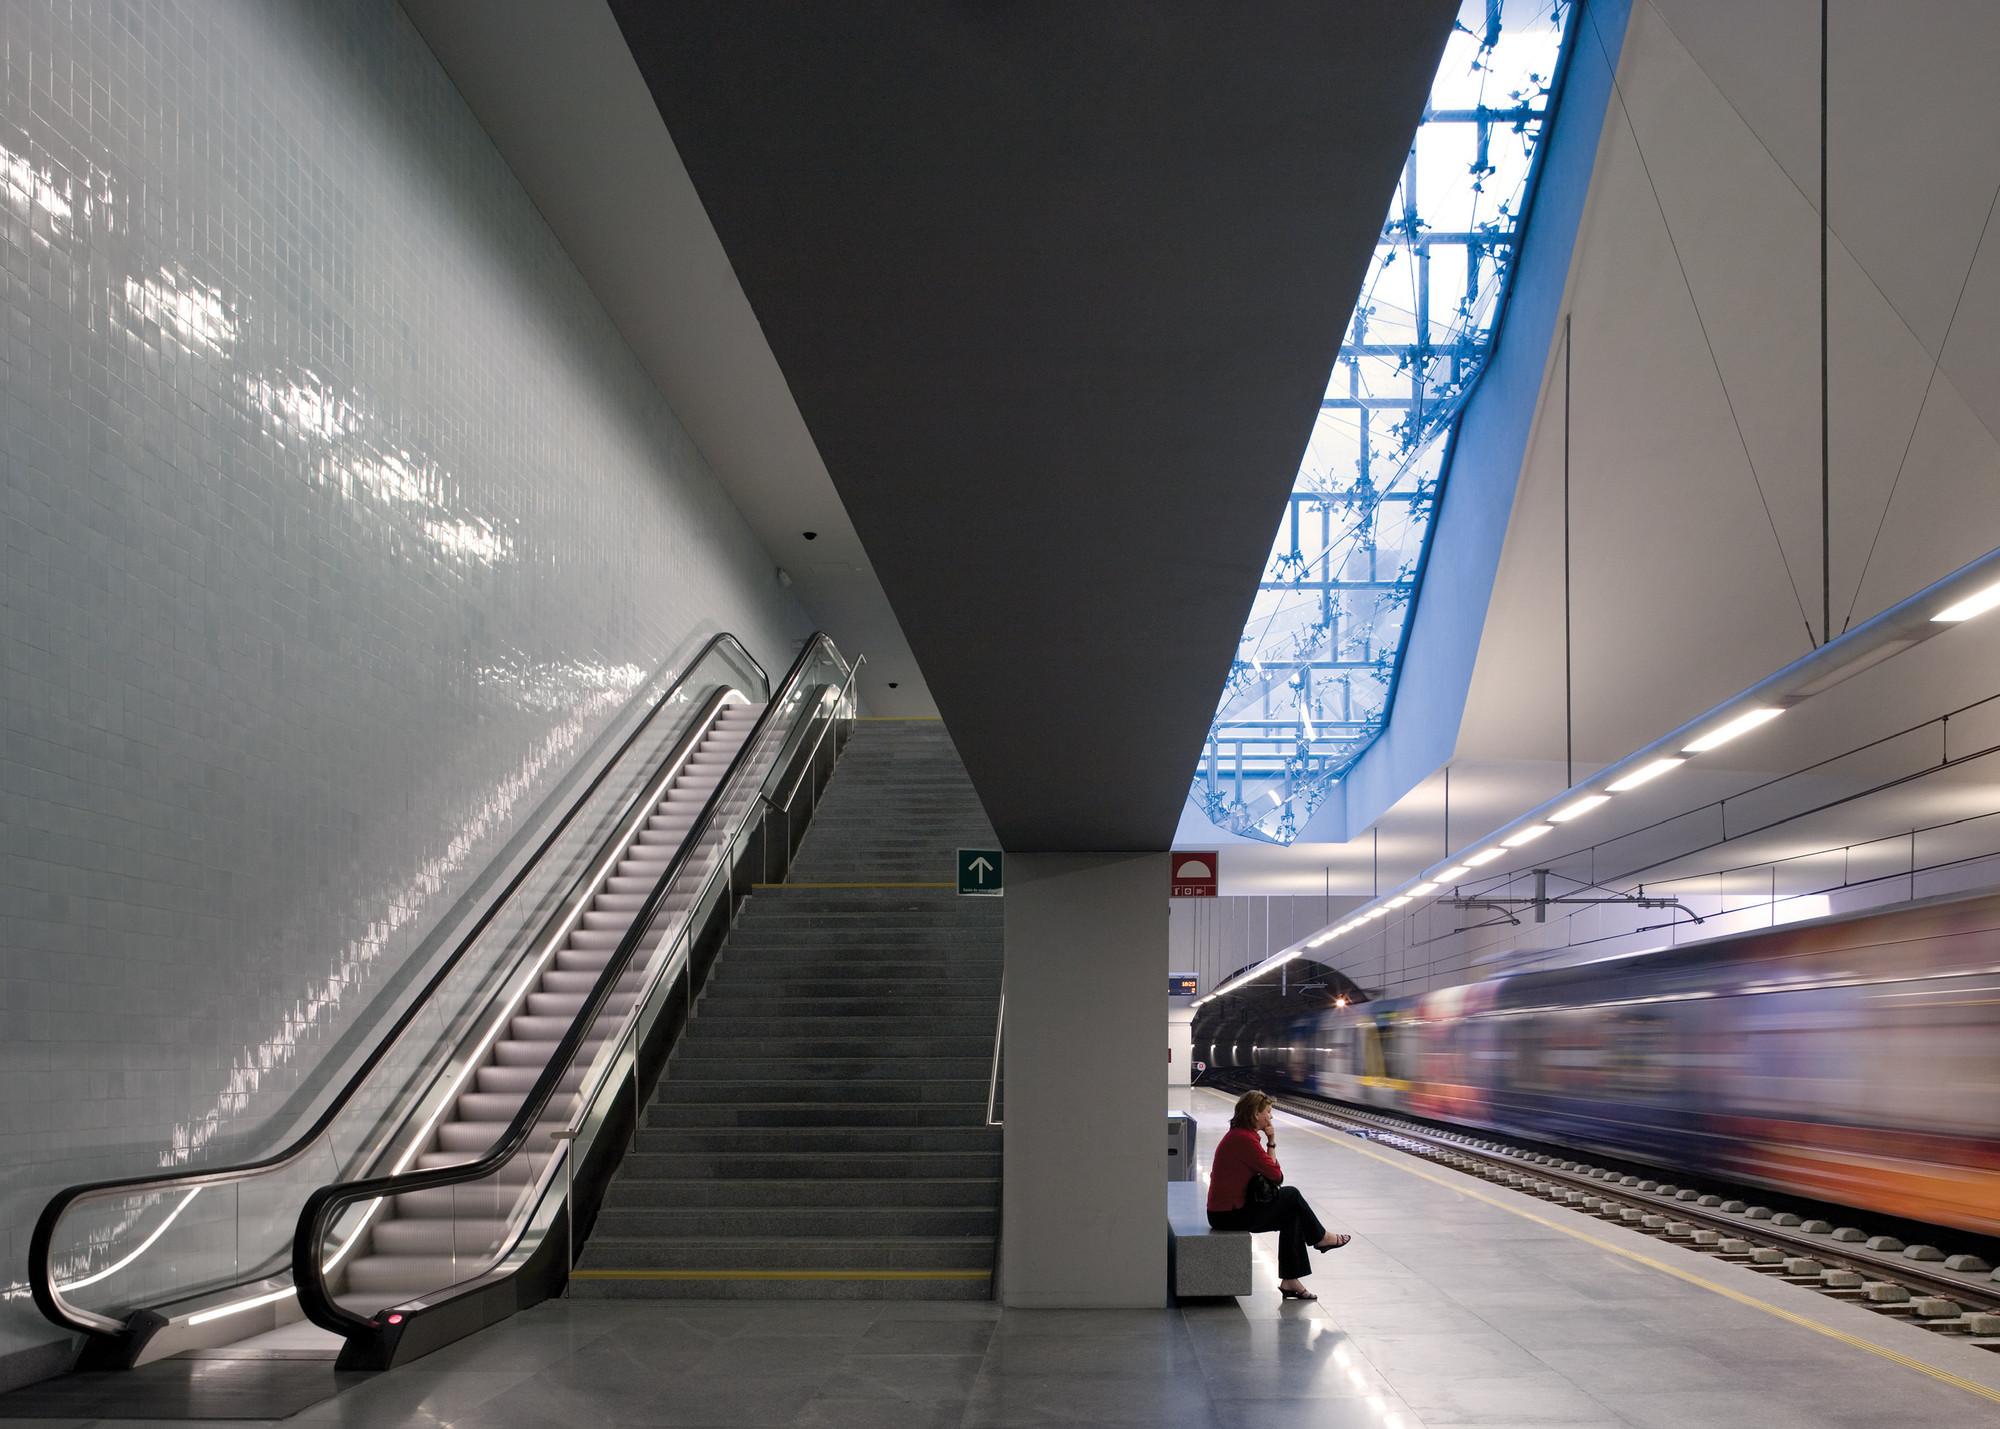 Winners Announced for 2013 Veronica Rudge Green Prize in Urban Design